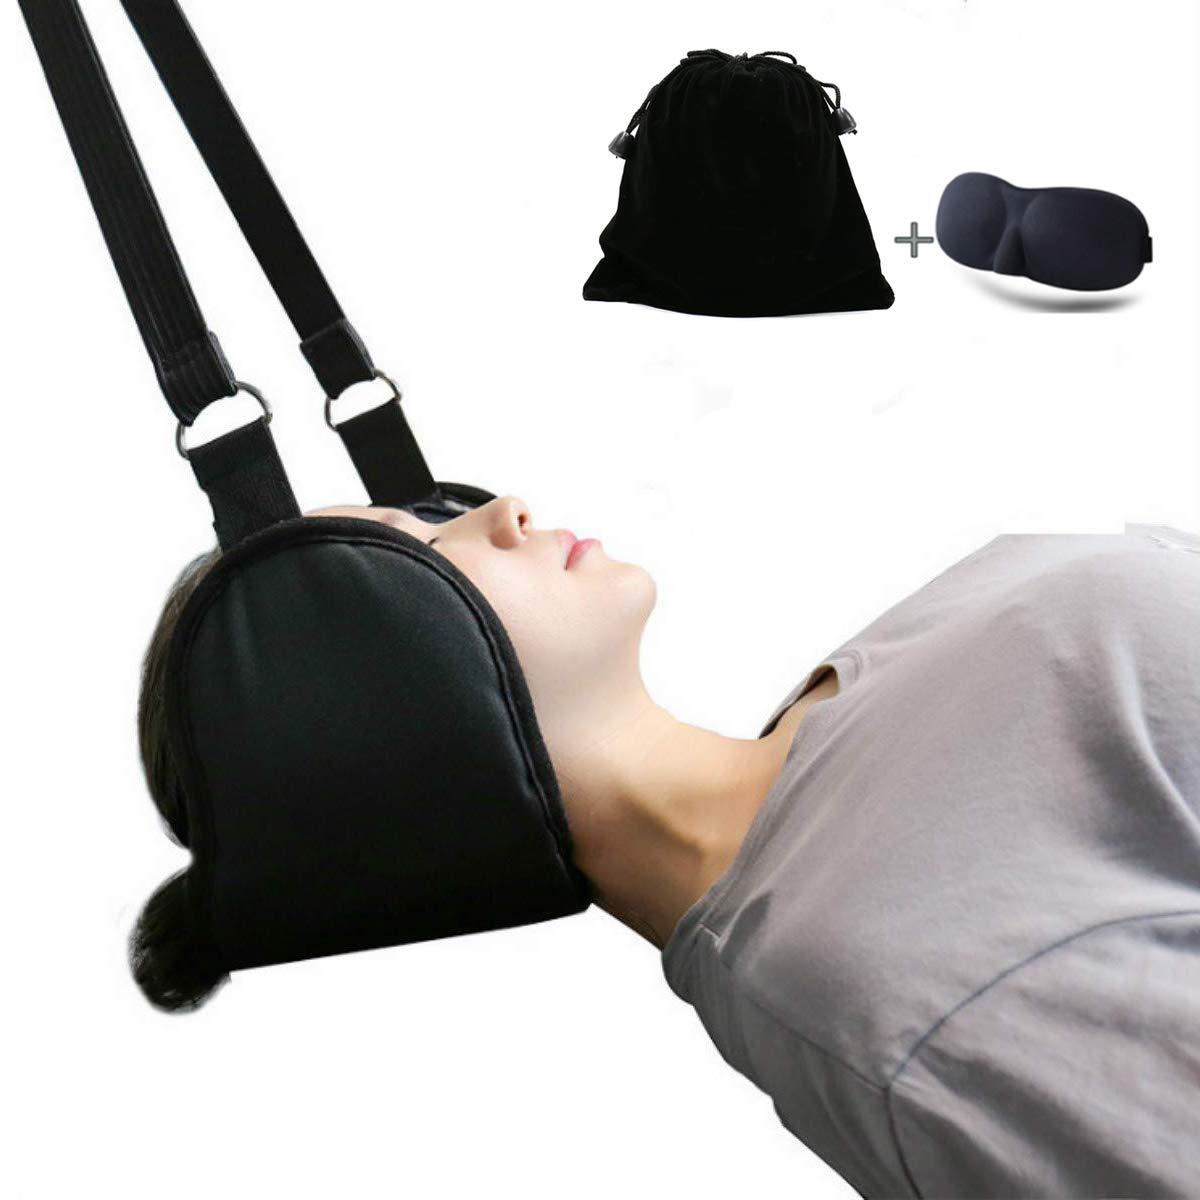 Hammock for Neck - Neck Pain Relief Hammock, Affordable Cervical Traction Hammock Device (deep Black)